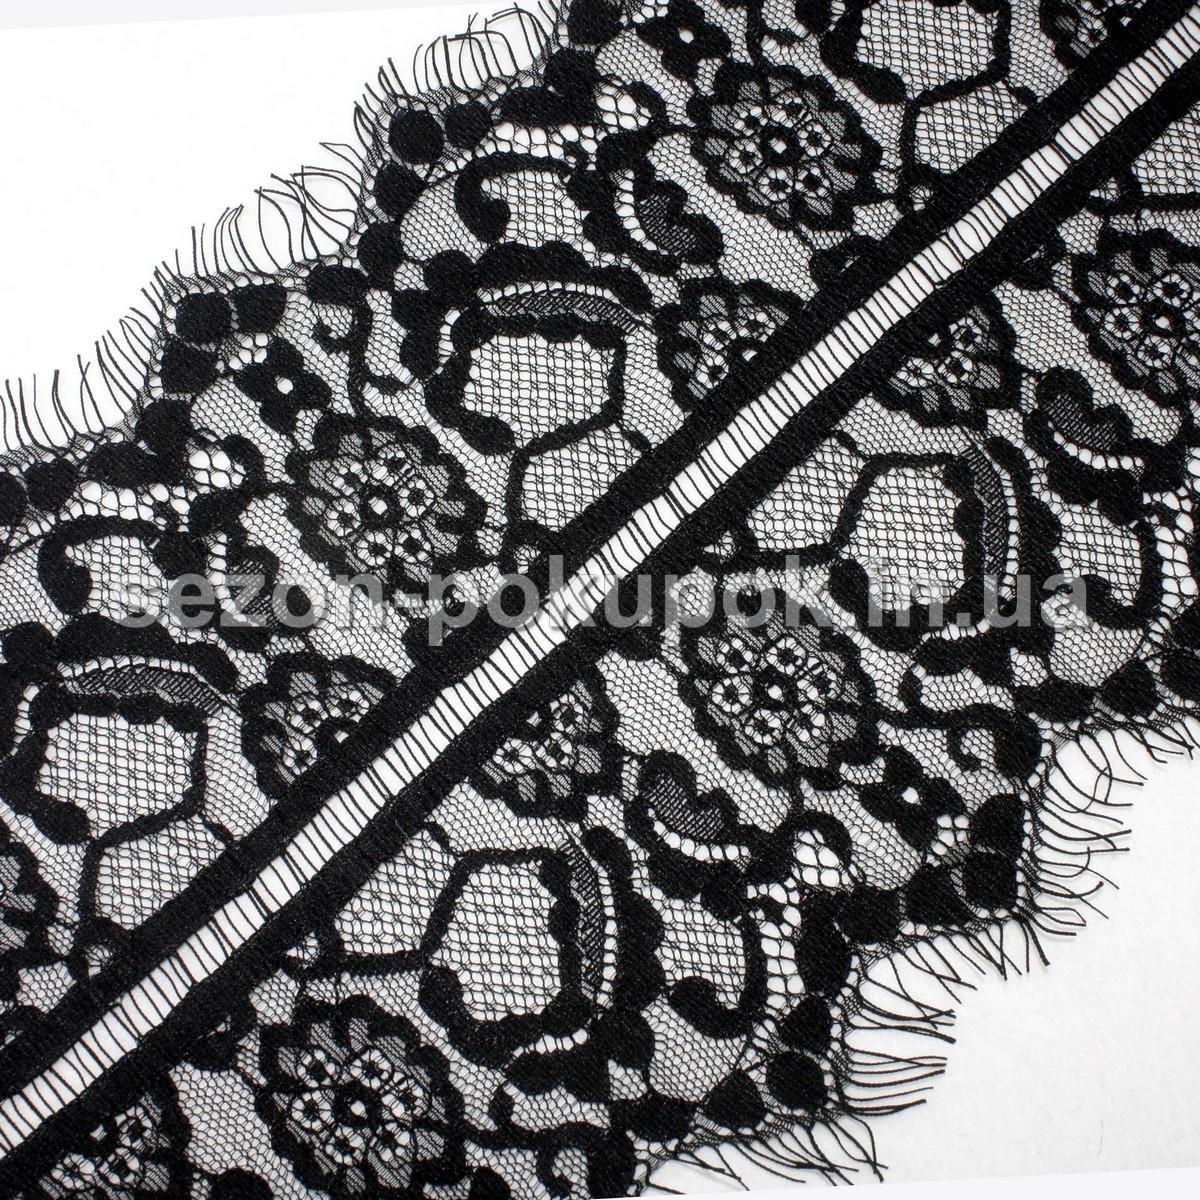 Французское кружево (Шантильи, с ресничками) ширина 18см (цена за 3 м). Цвет - черный